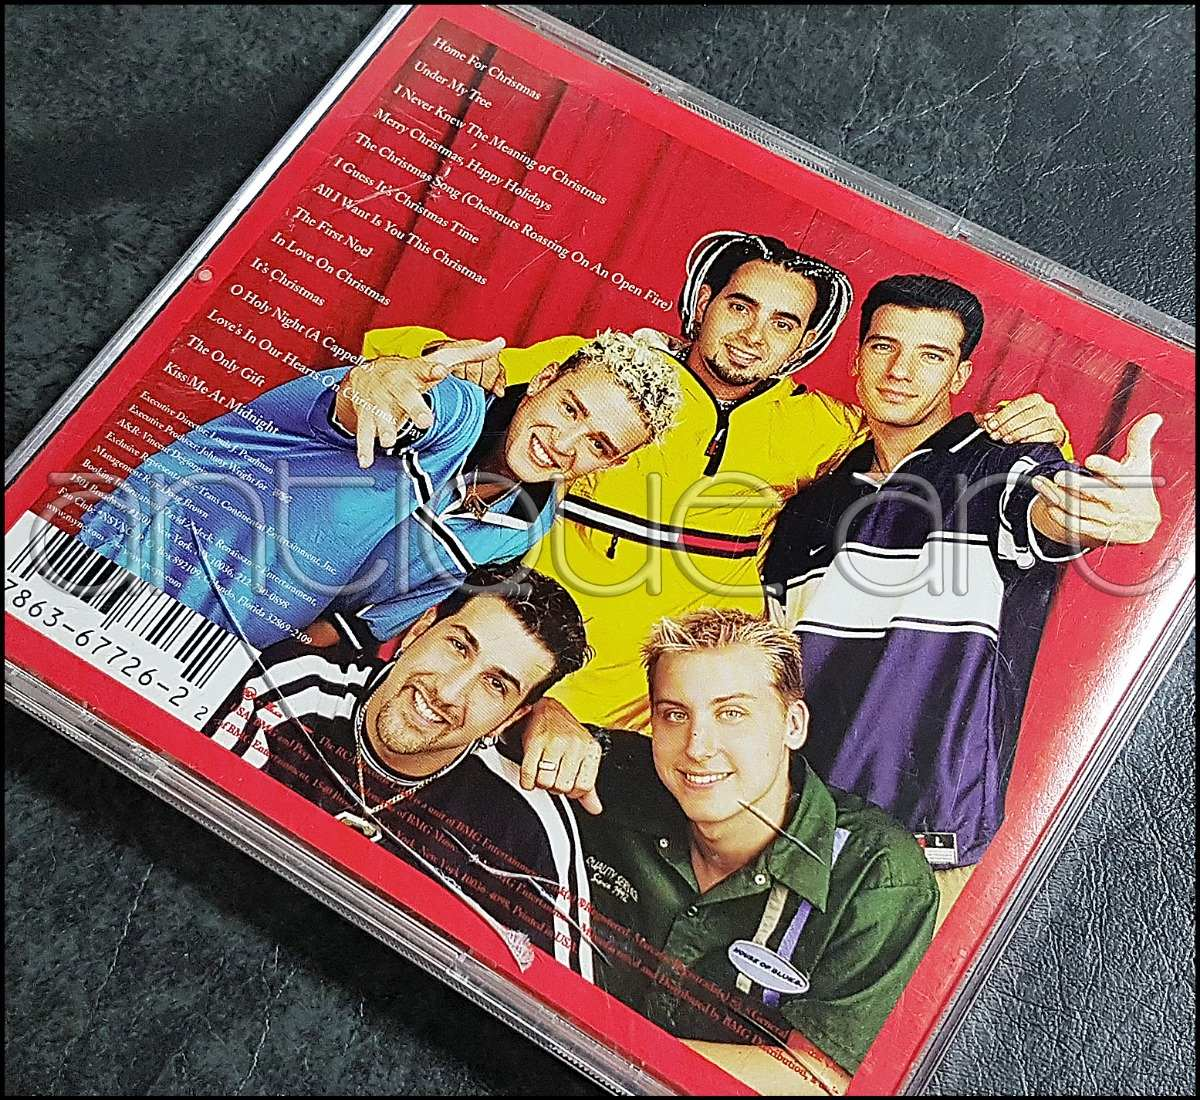 A64 Cd Nsync Home For Christmas ©2000 Pop Musica Navidad - S/ 35,00 ...